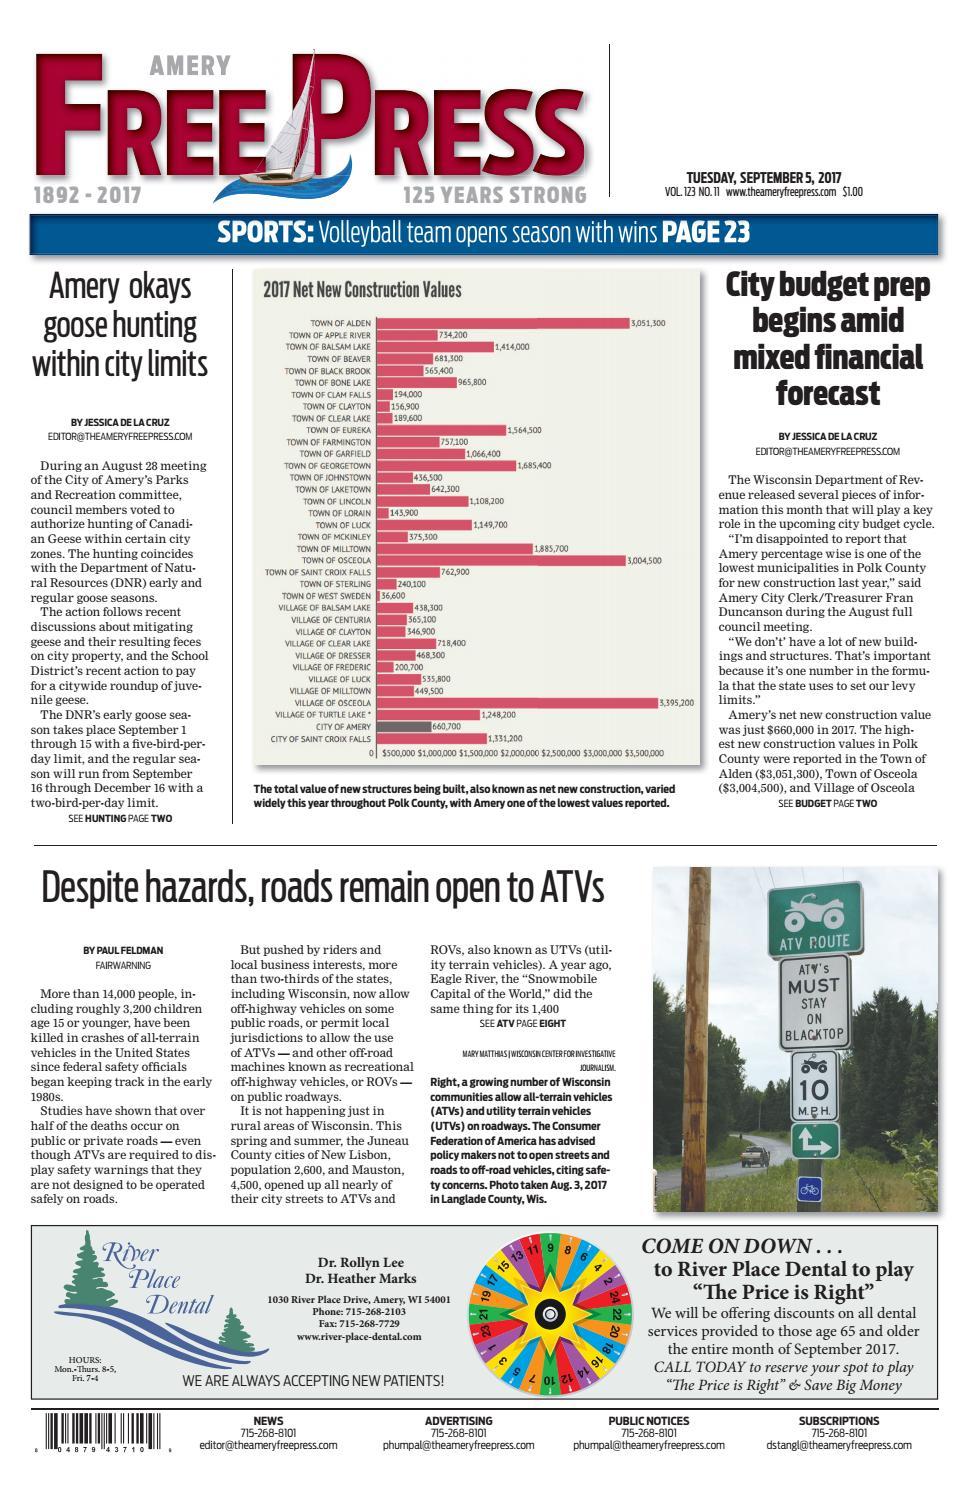 Afp 09 05 17 by Amery Free Press - issuu